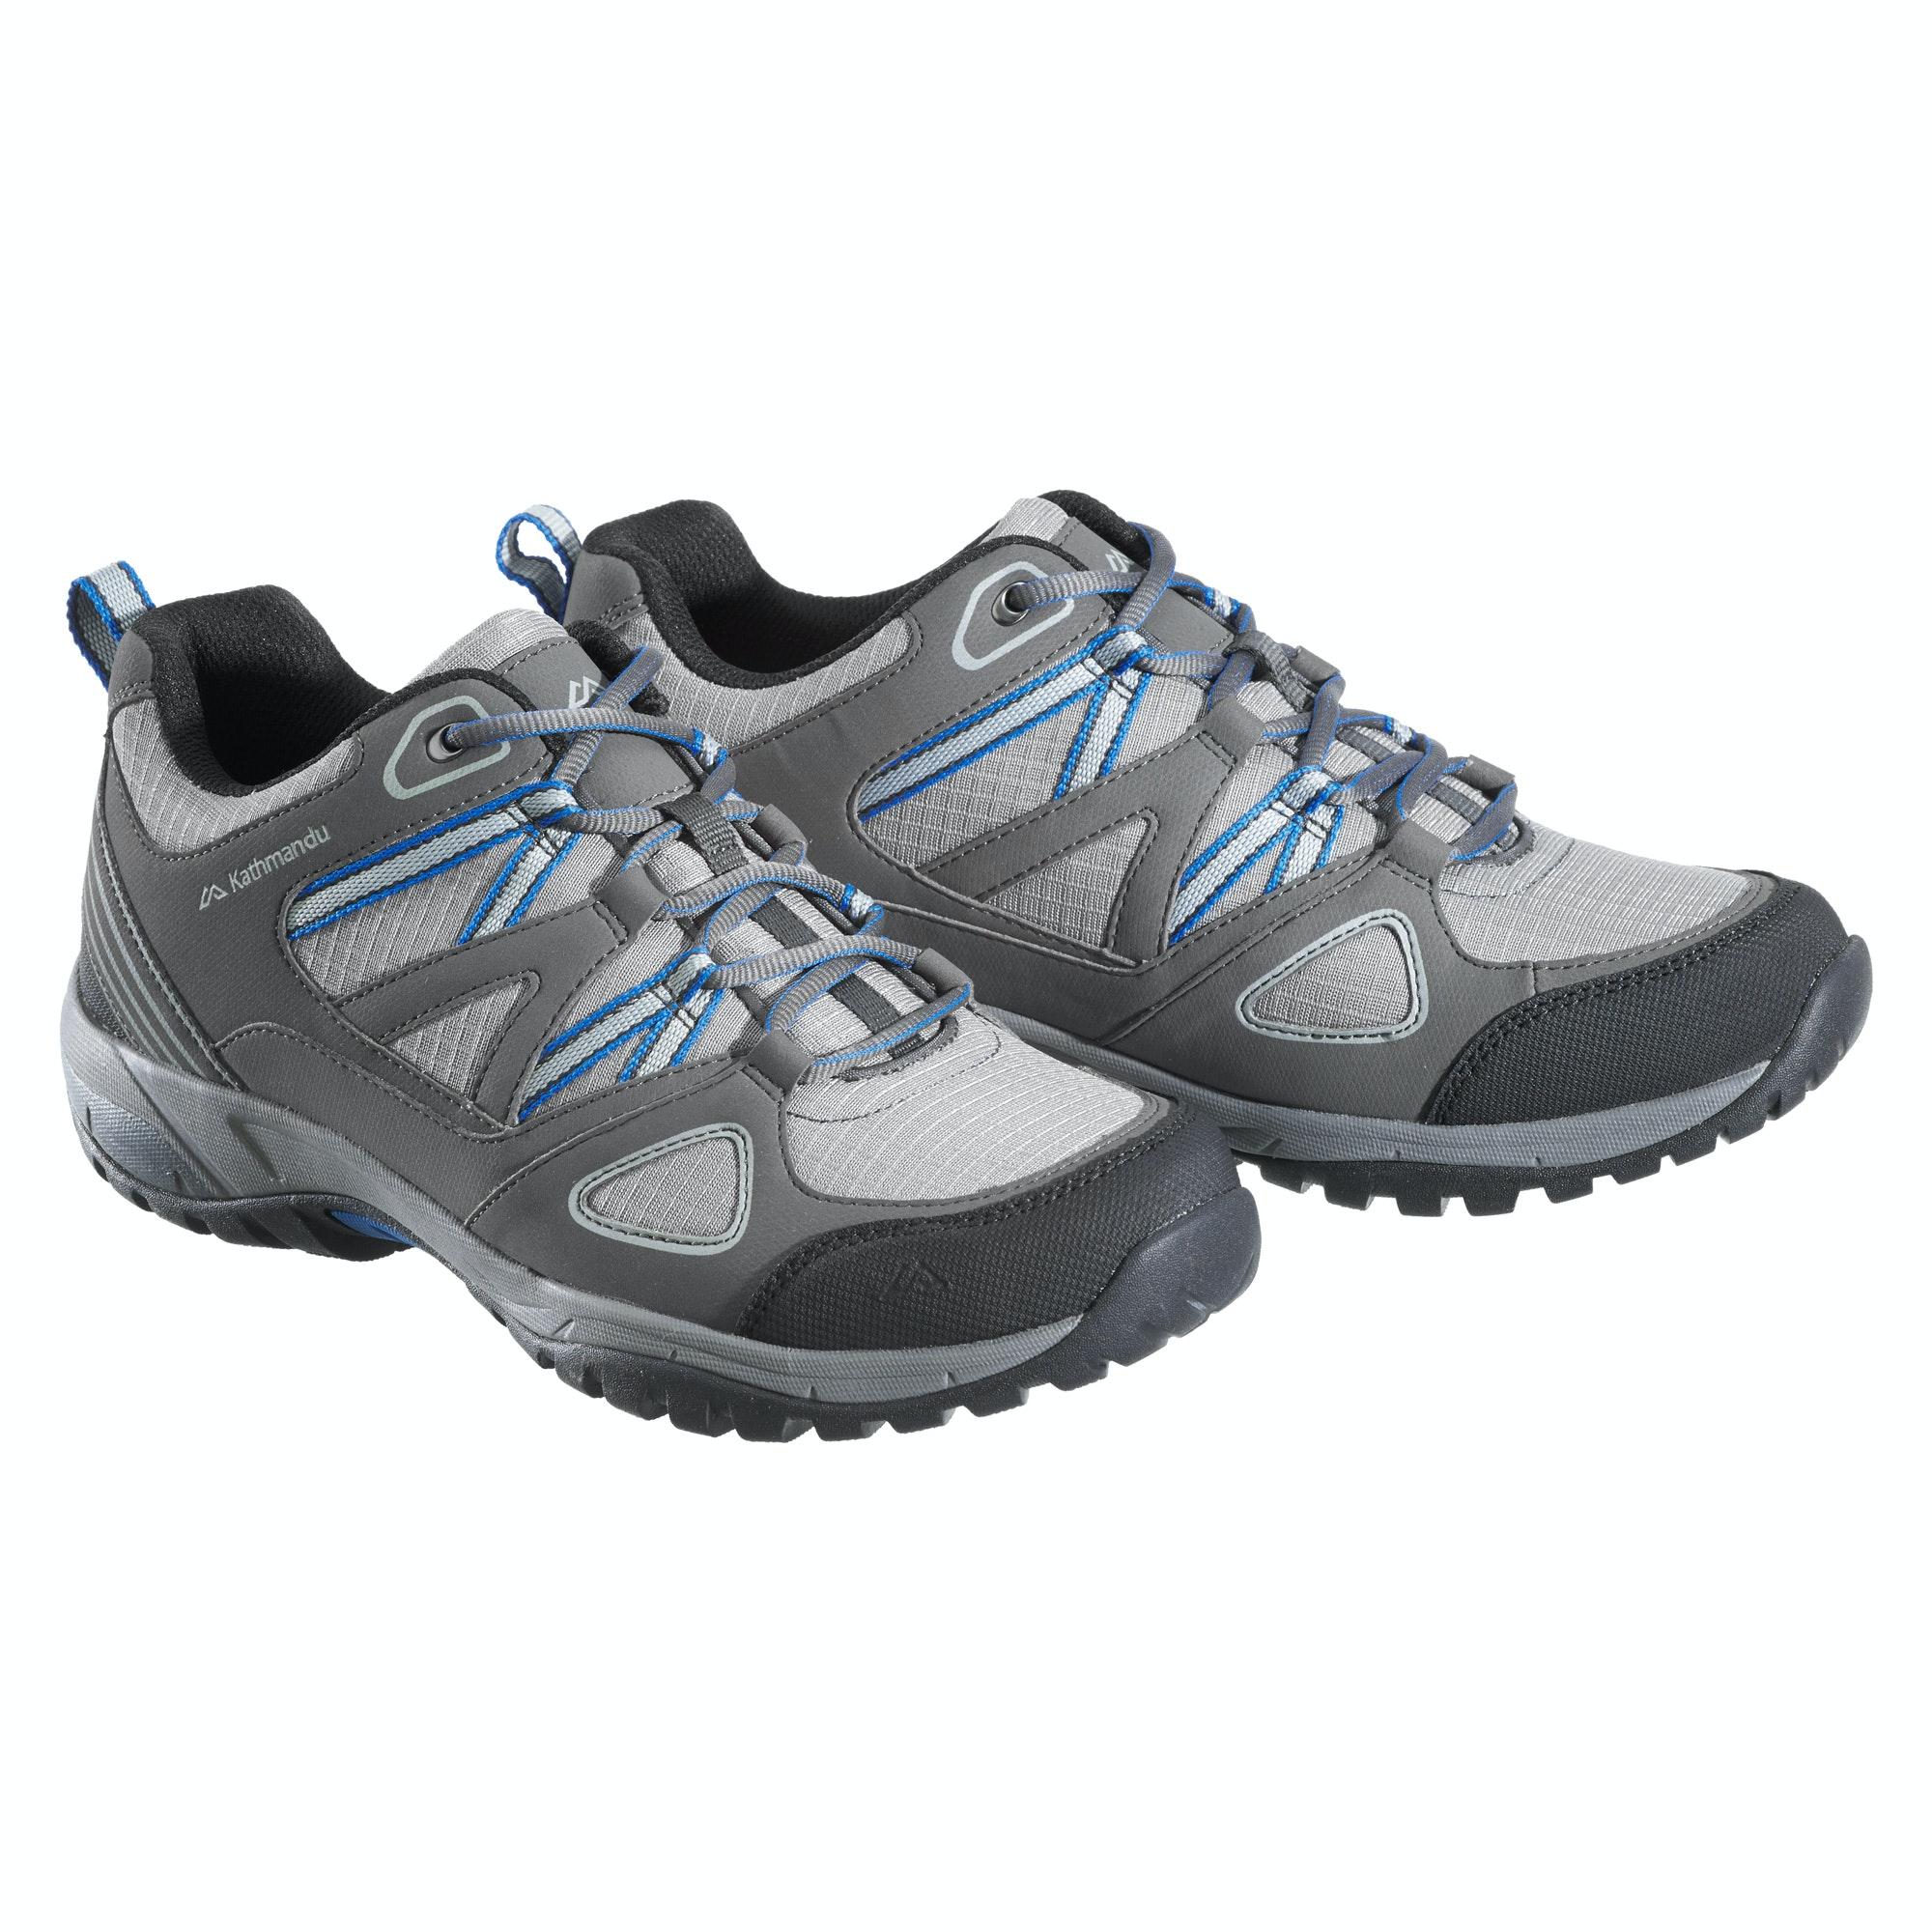 kathmandu serpentine ii mens lighweight durable hiking